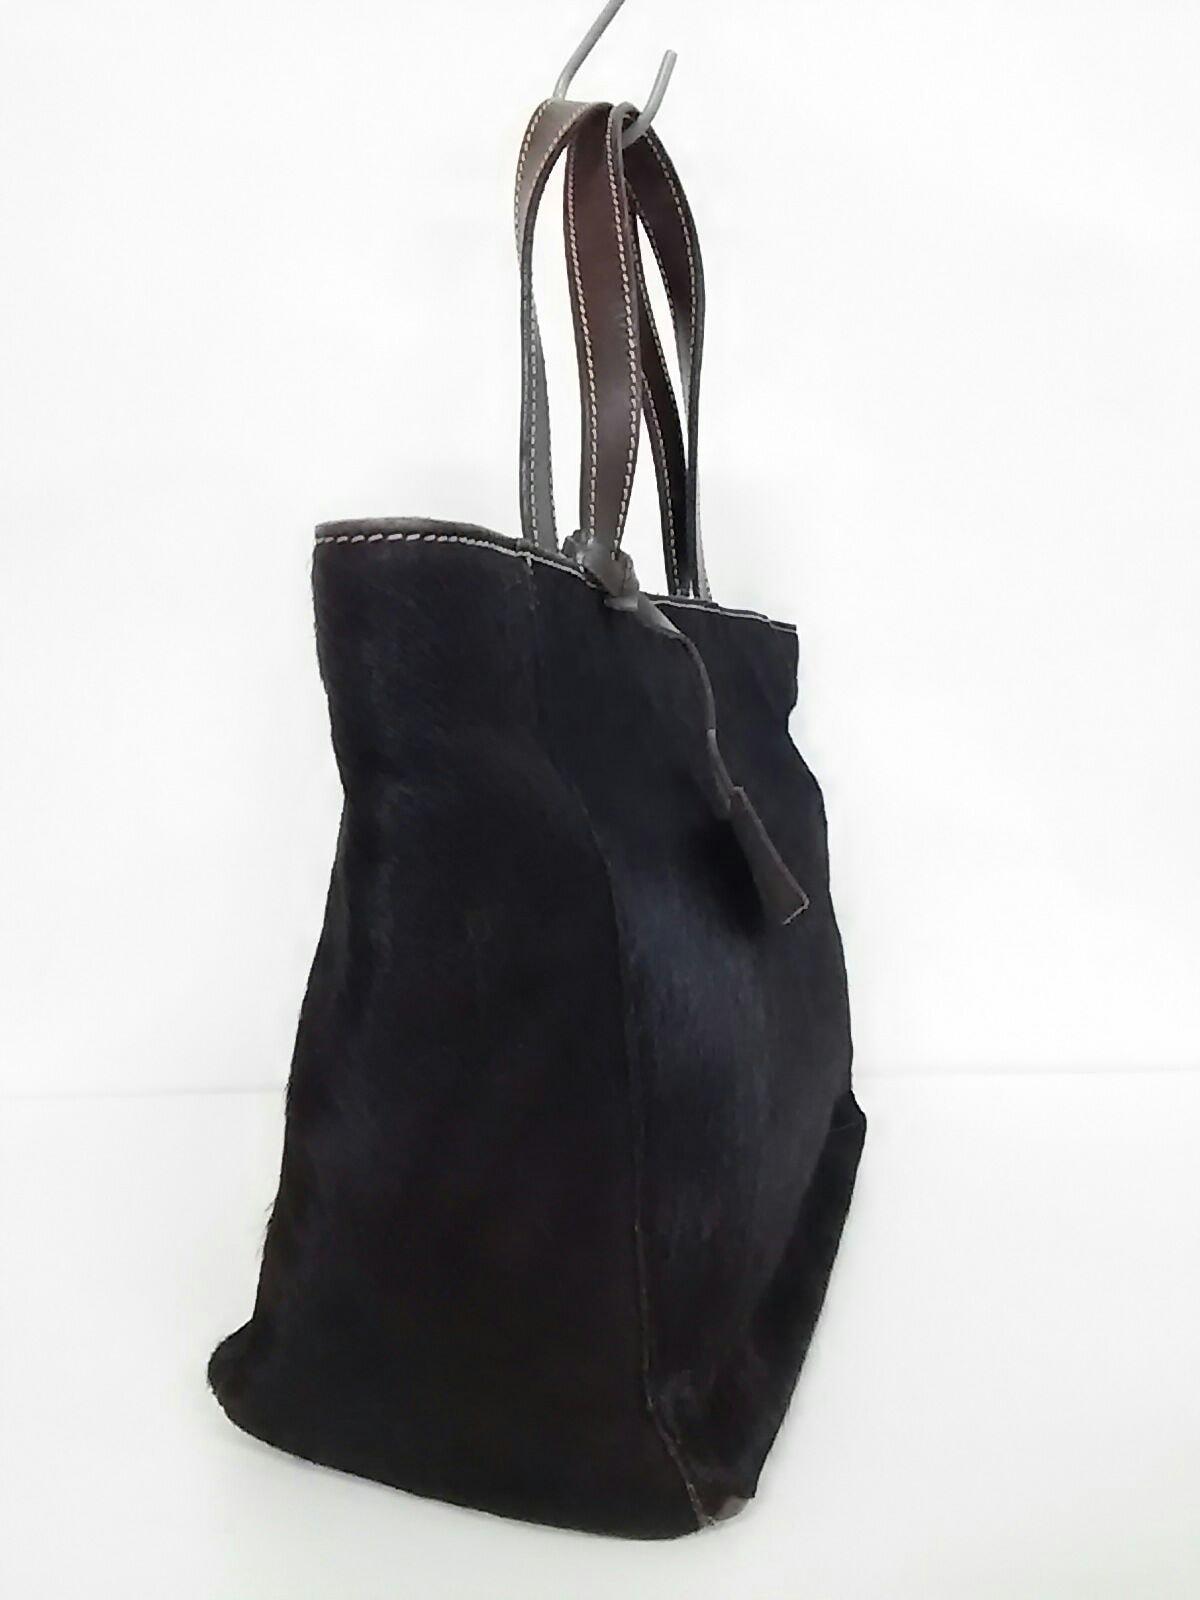 LOXWOOD(ロックスウッド)のトートバッグ